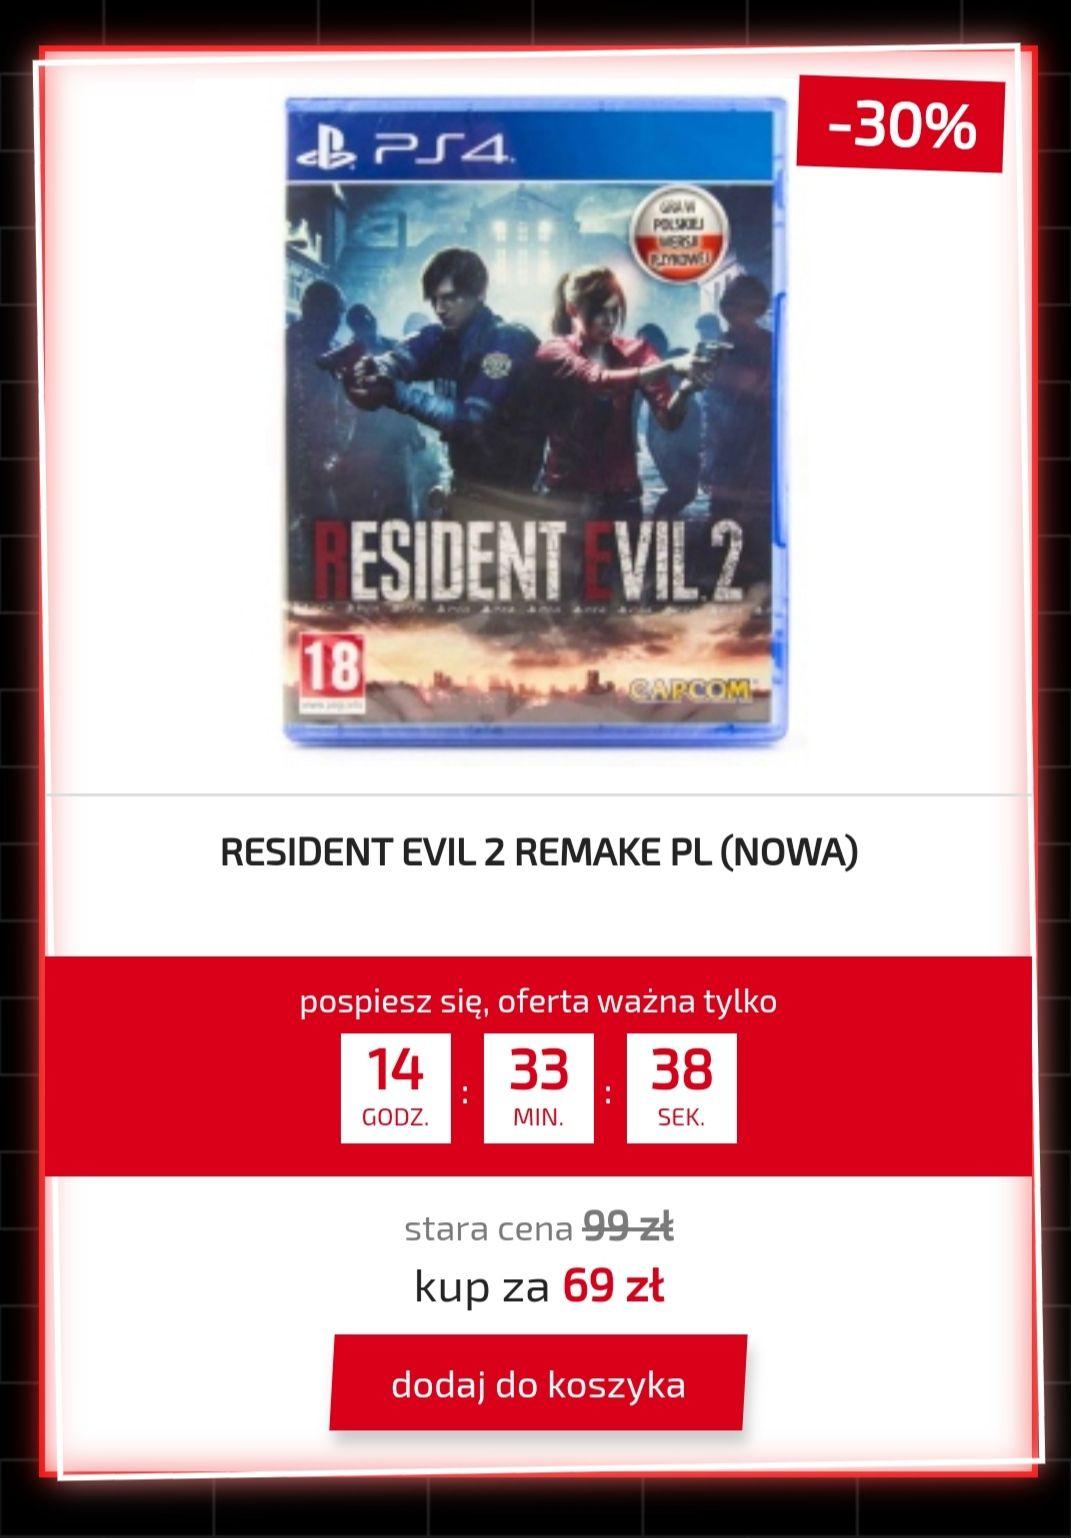 RESIDENT EVIL 2 REMAKE PL PS4 @Shopgamer.pl